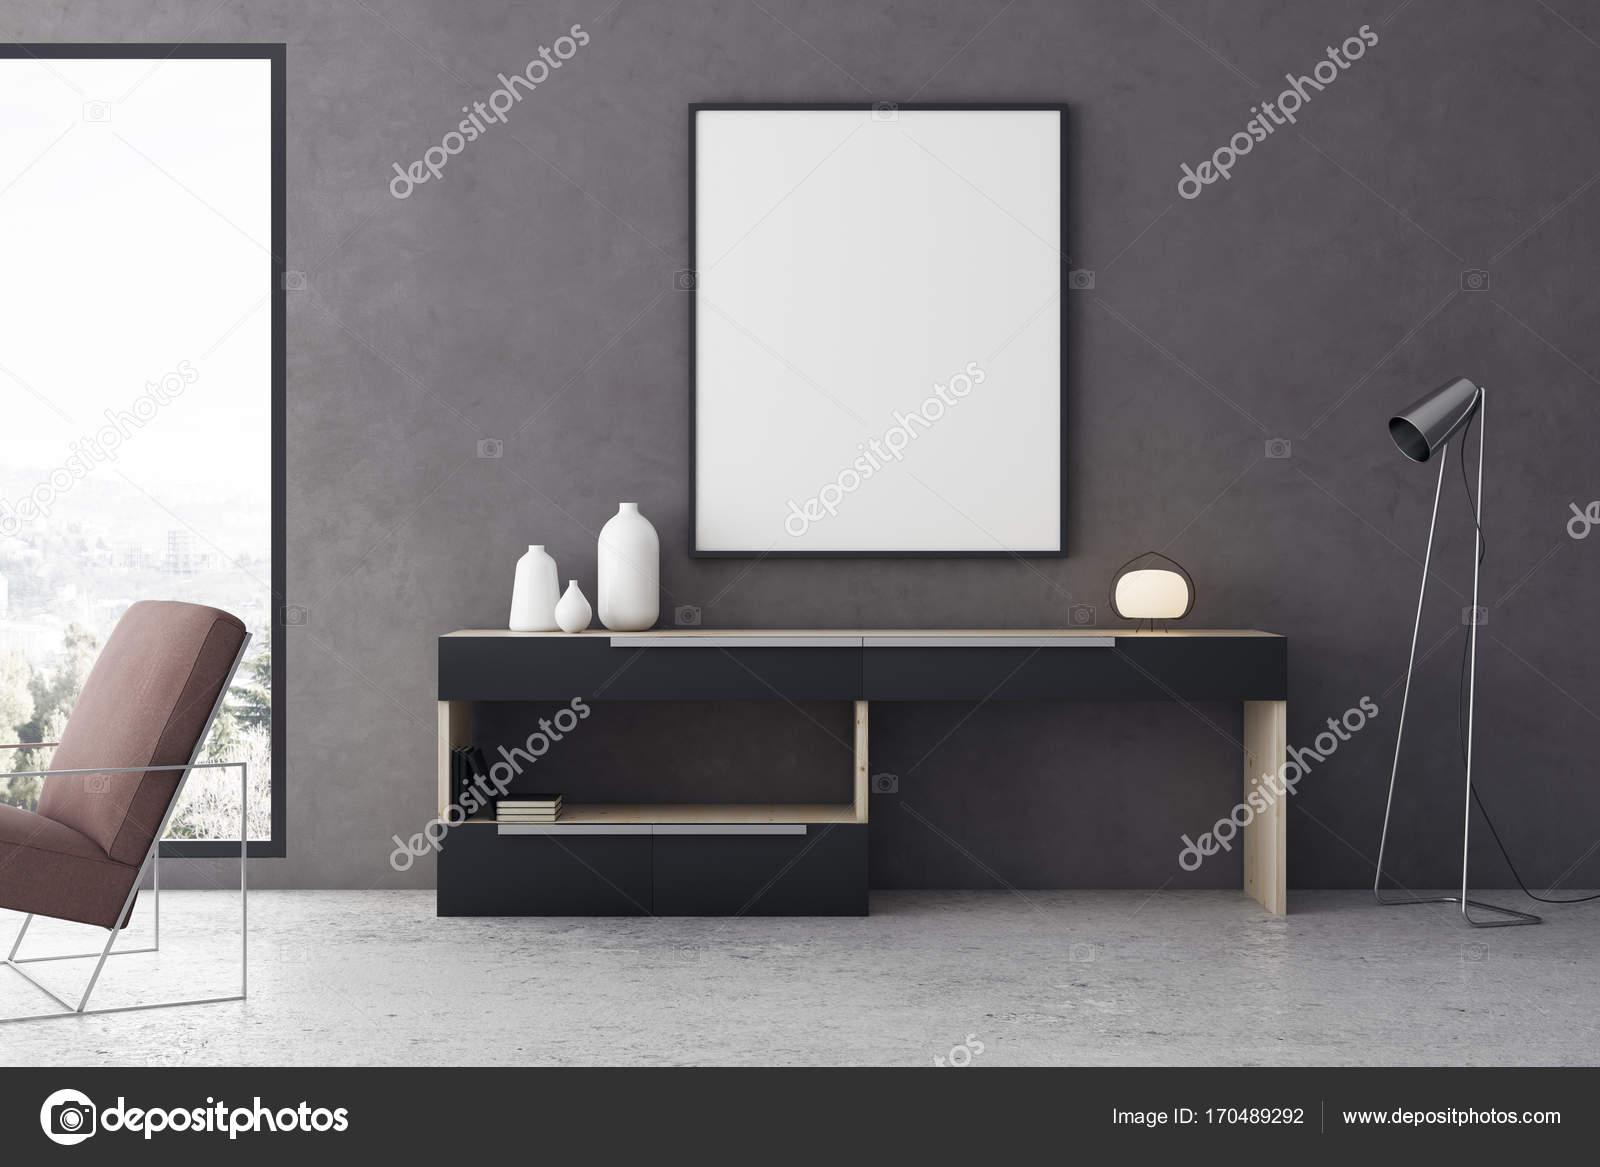 Moderne Wohnzimmer Interieur Wth banner — Stockfoto © peshkova ...